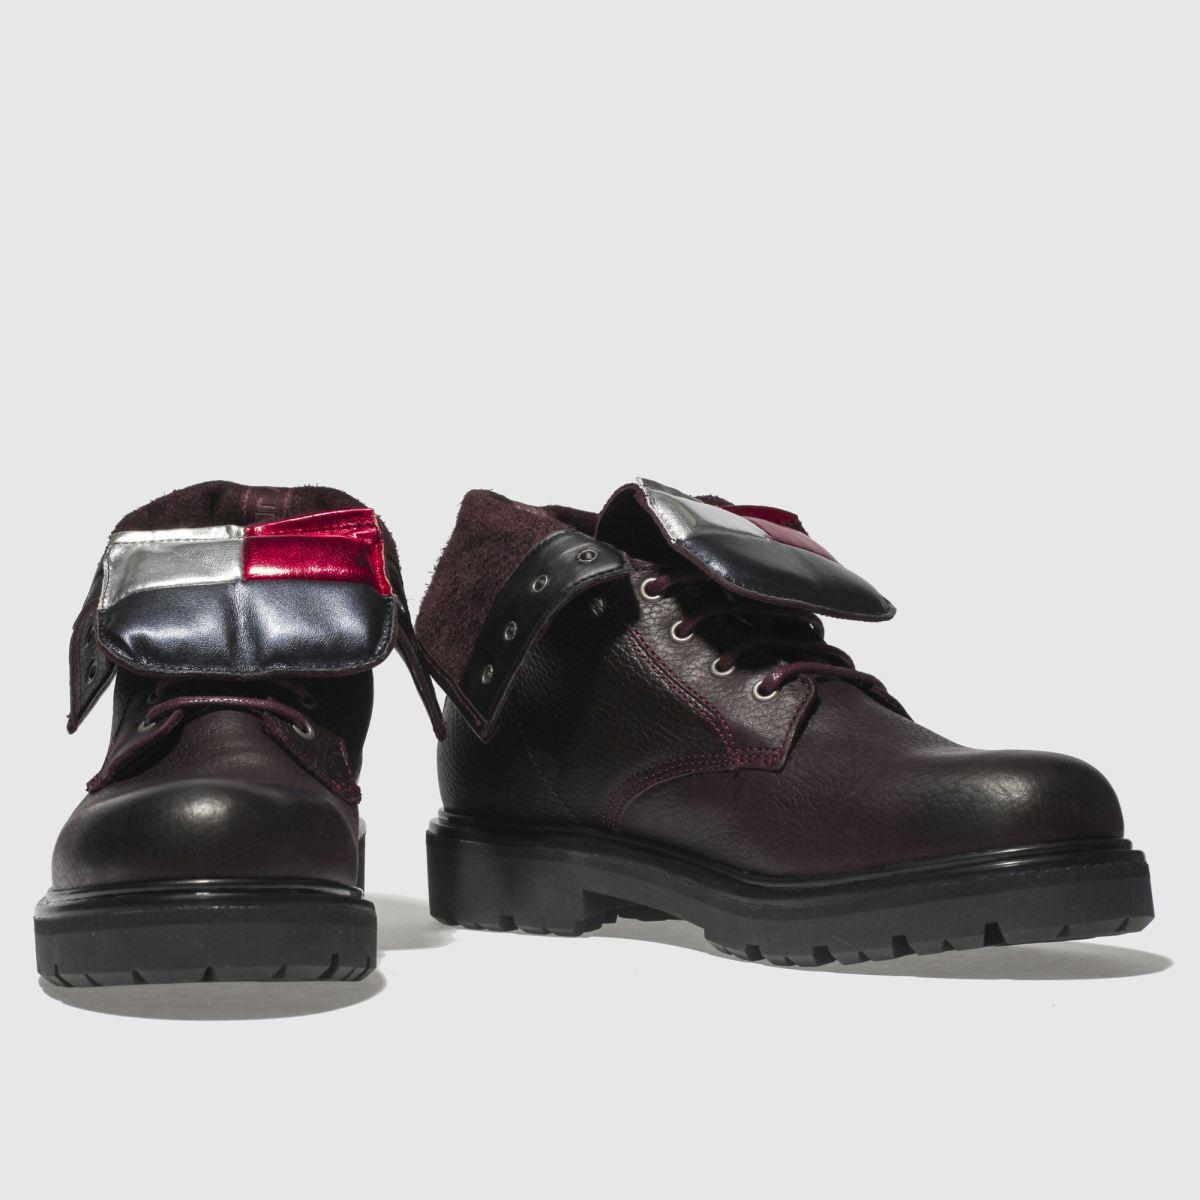 Damen Big Weinrot tommy hilfiger Tj Big Damen Flag Lace Up Boots   schuh Gute Qualität beliebte Schuhe 204016